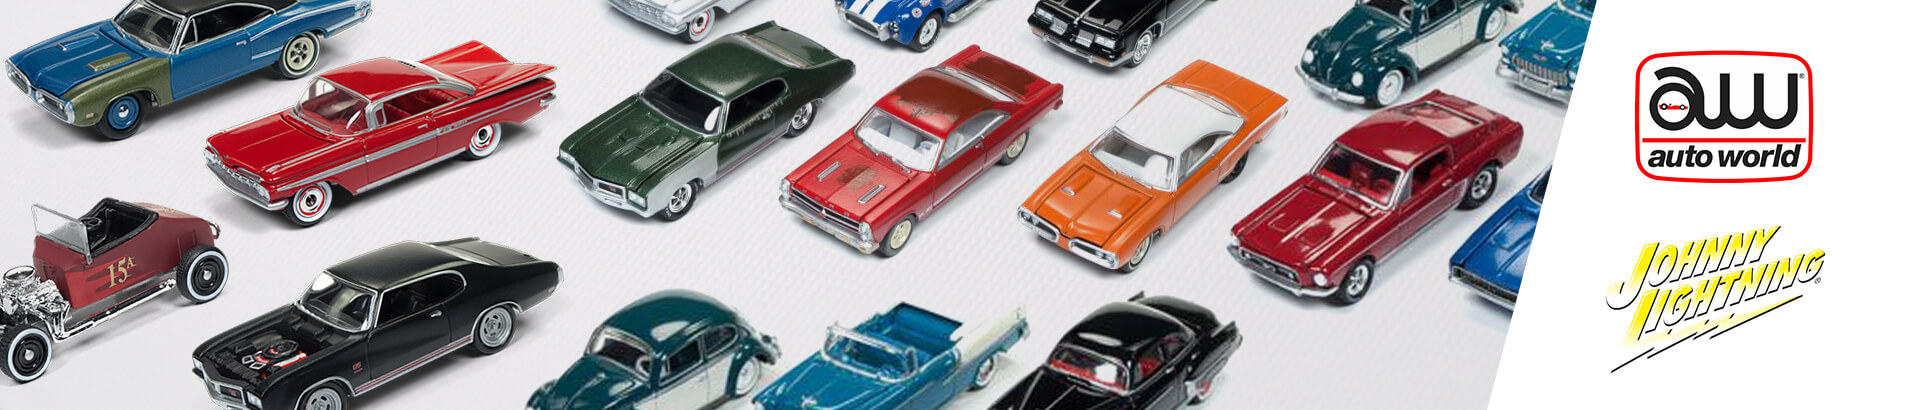 Výrobcovia Johnny Lightning a Auto World